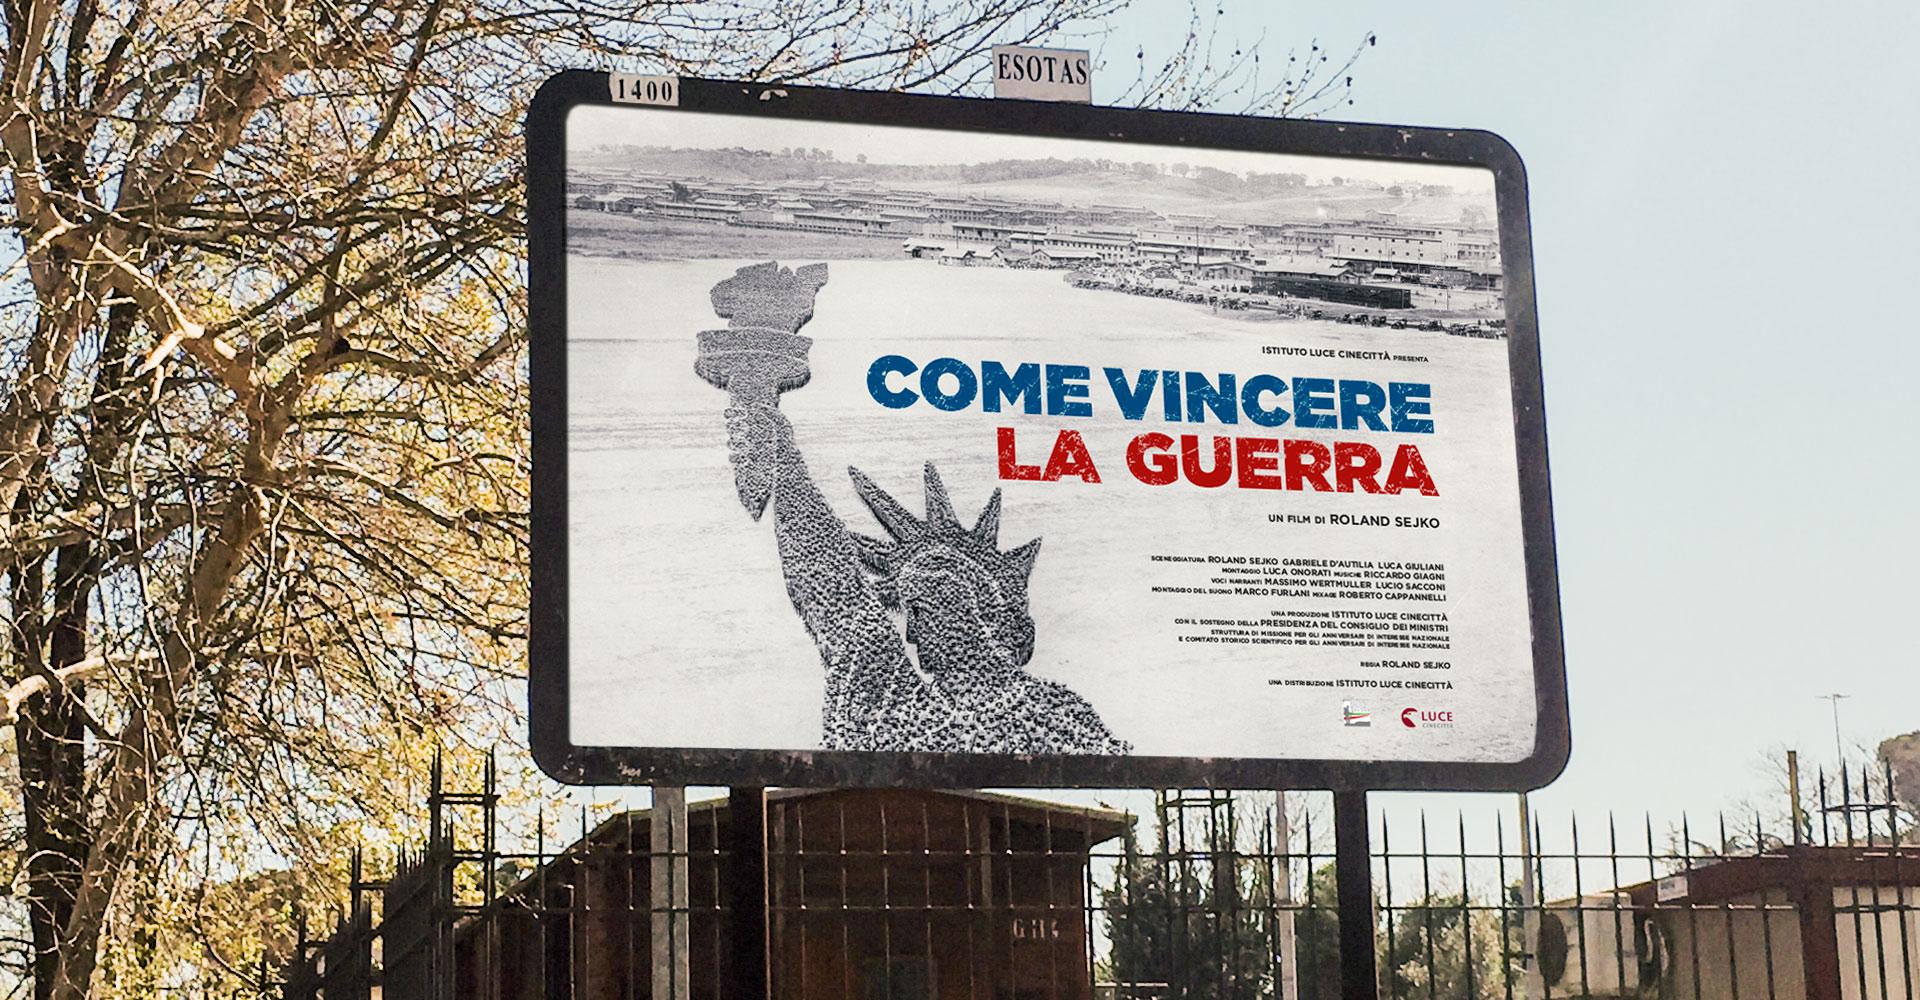 ComeVincereLaGuerra_03